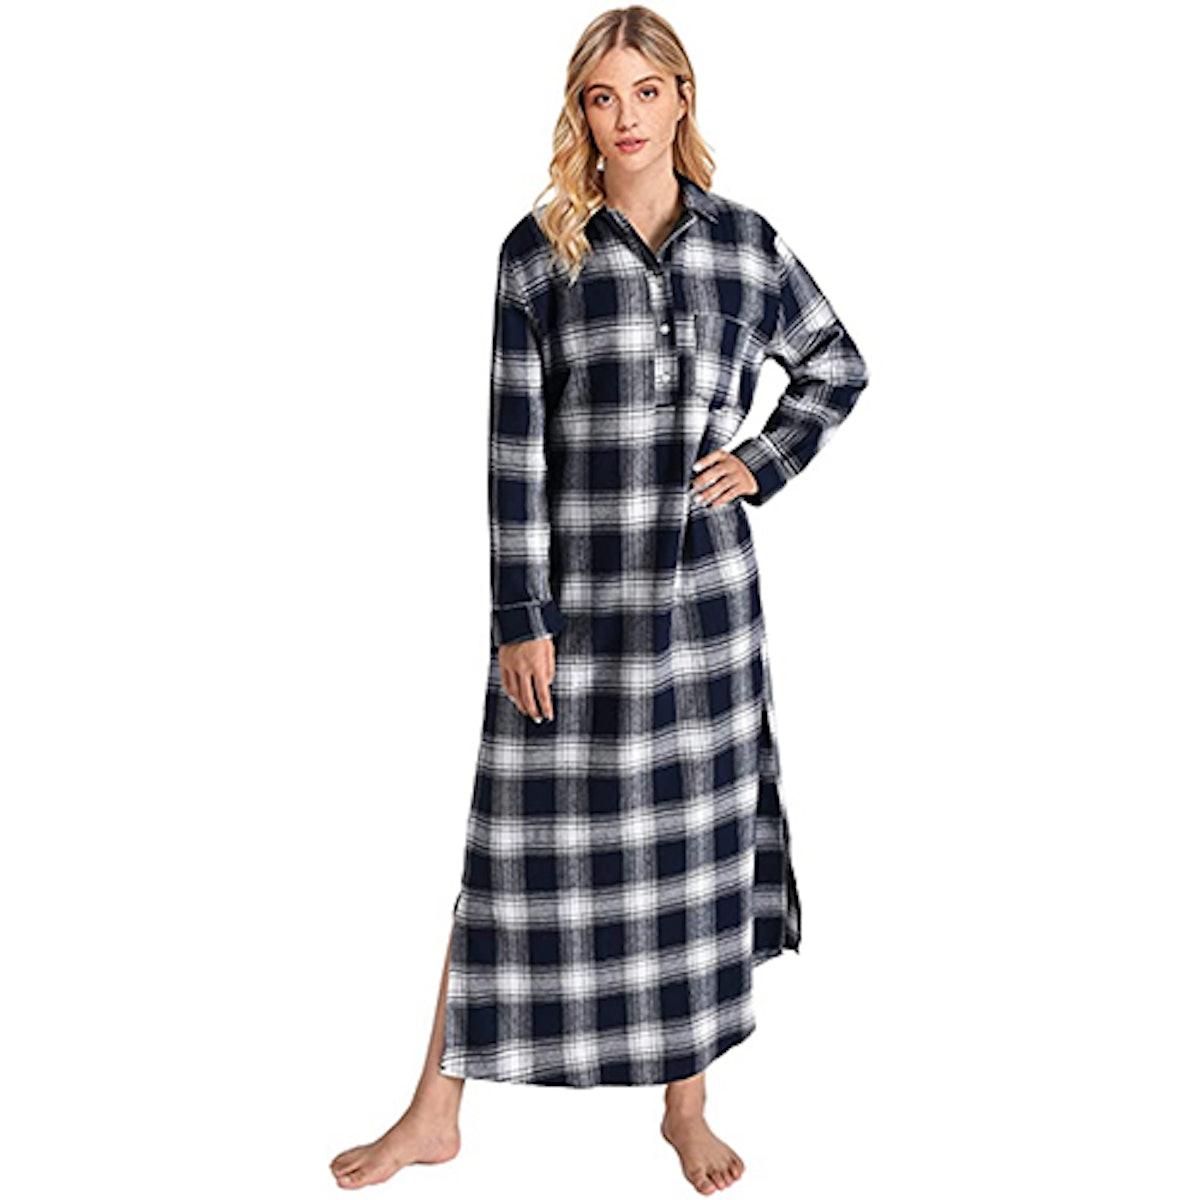 Latuza Plaid Flannel Nightgown